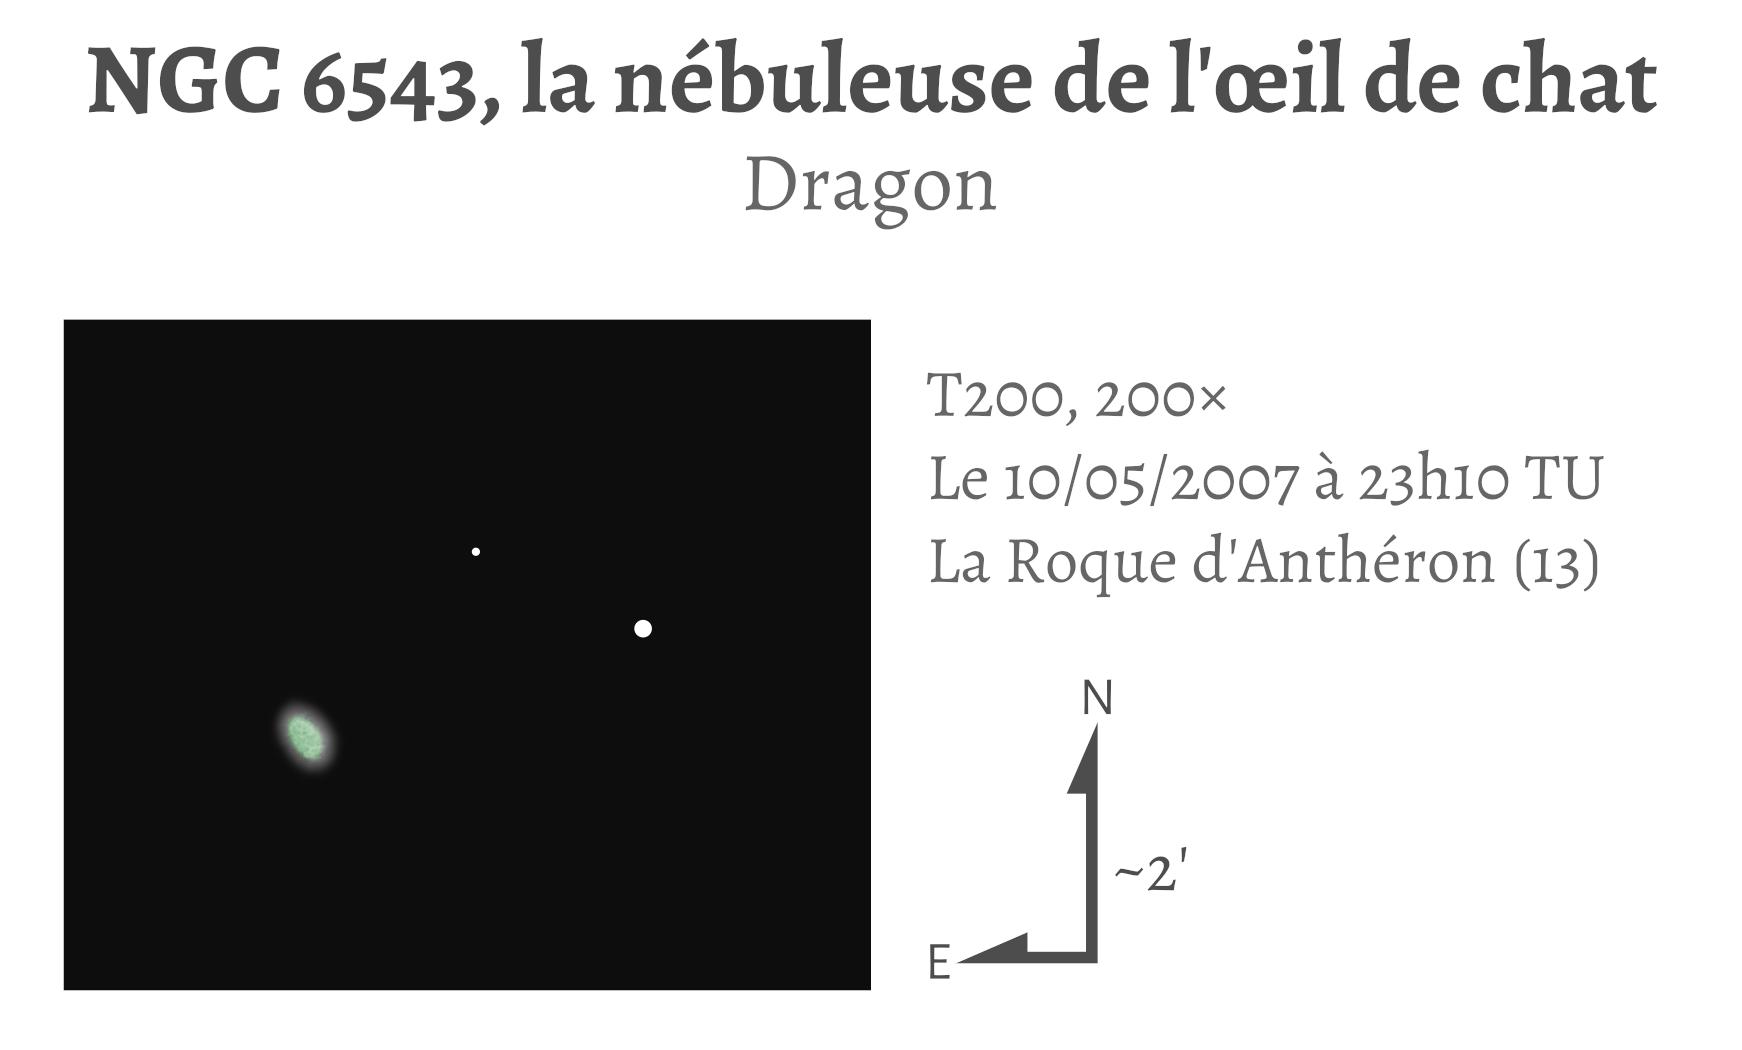 large.5e8b6c32950ed_NGC6543-T200.png.ddb3b903f0cf5dd16710b1265f9977be.png